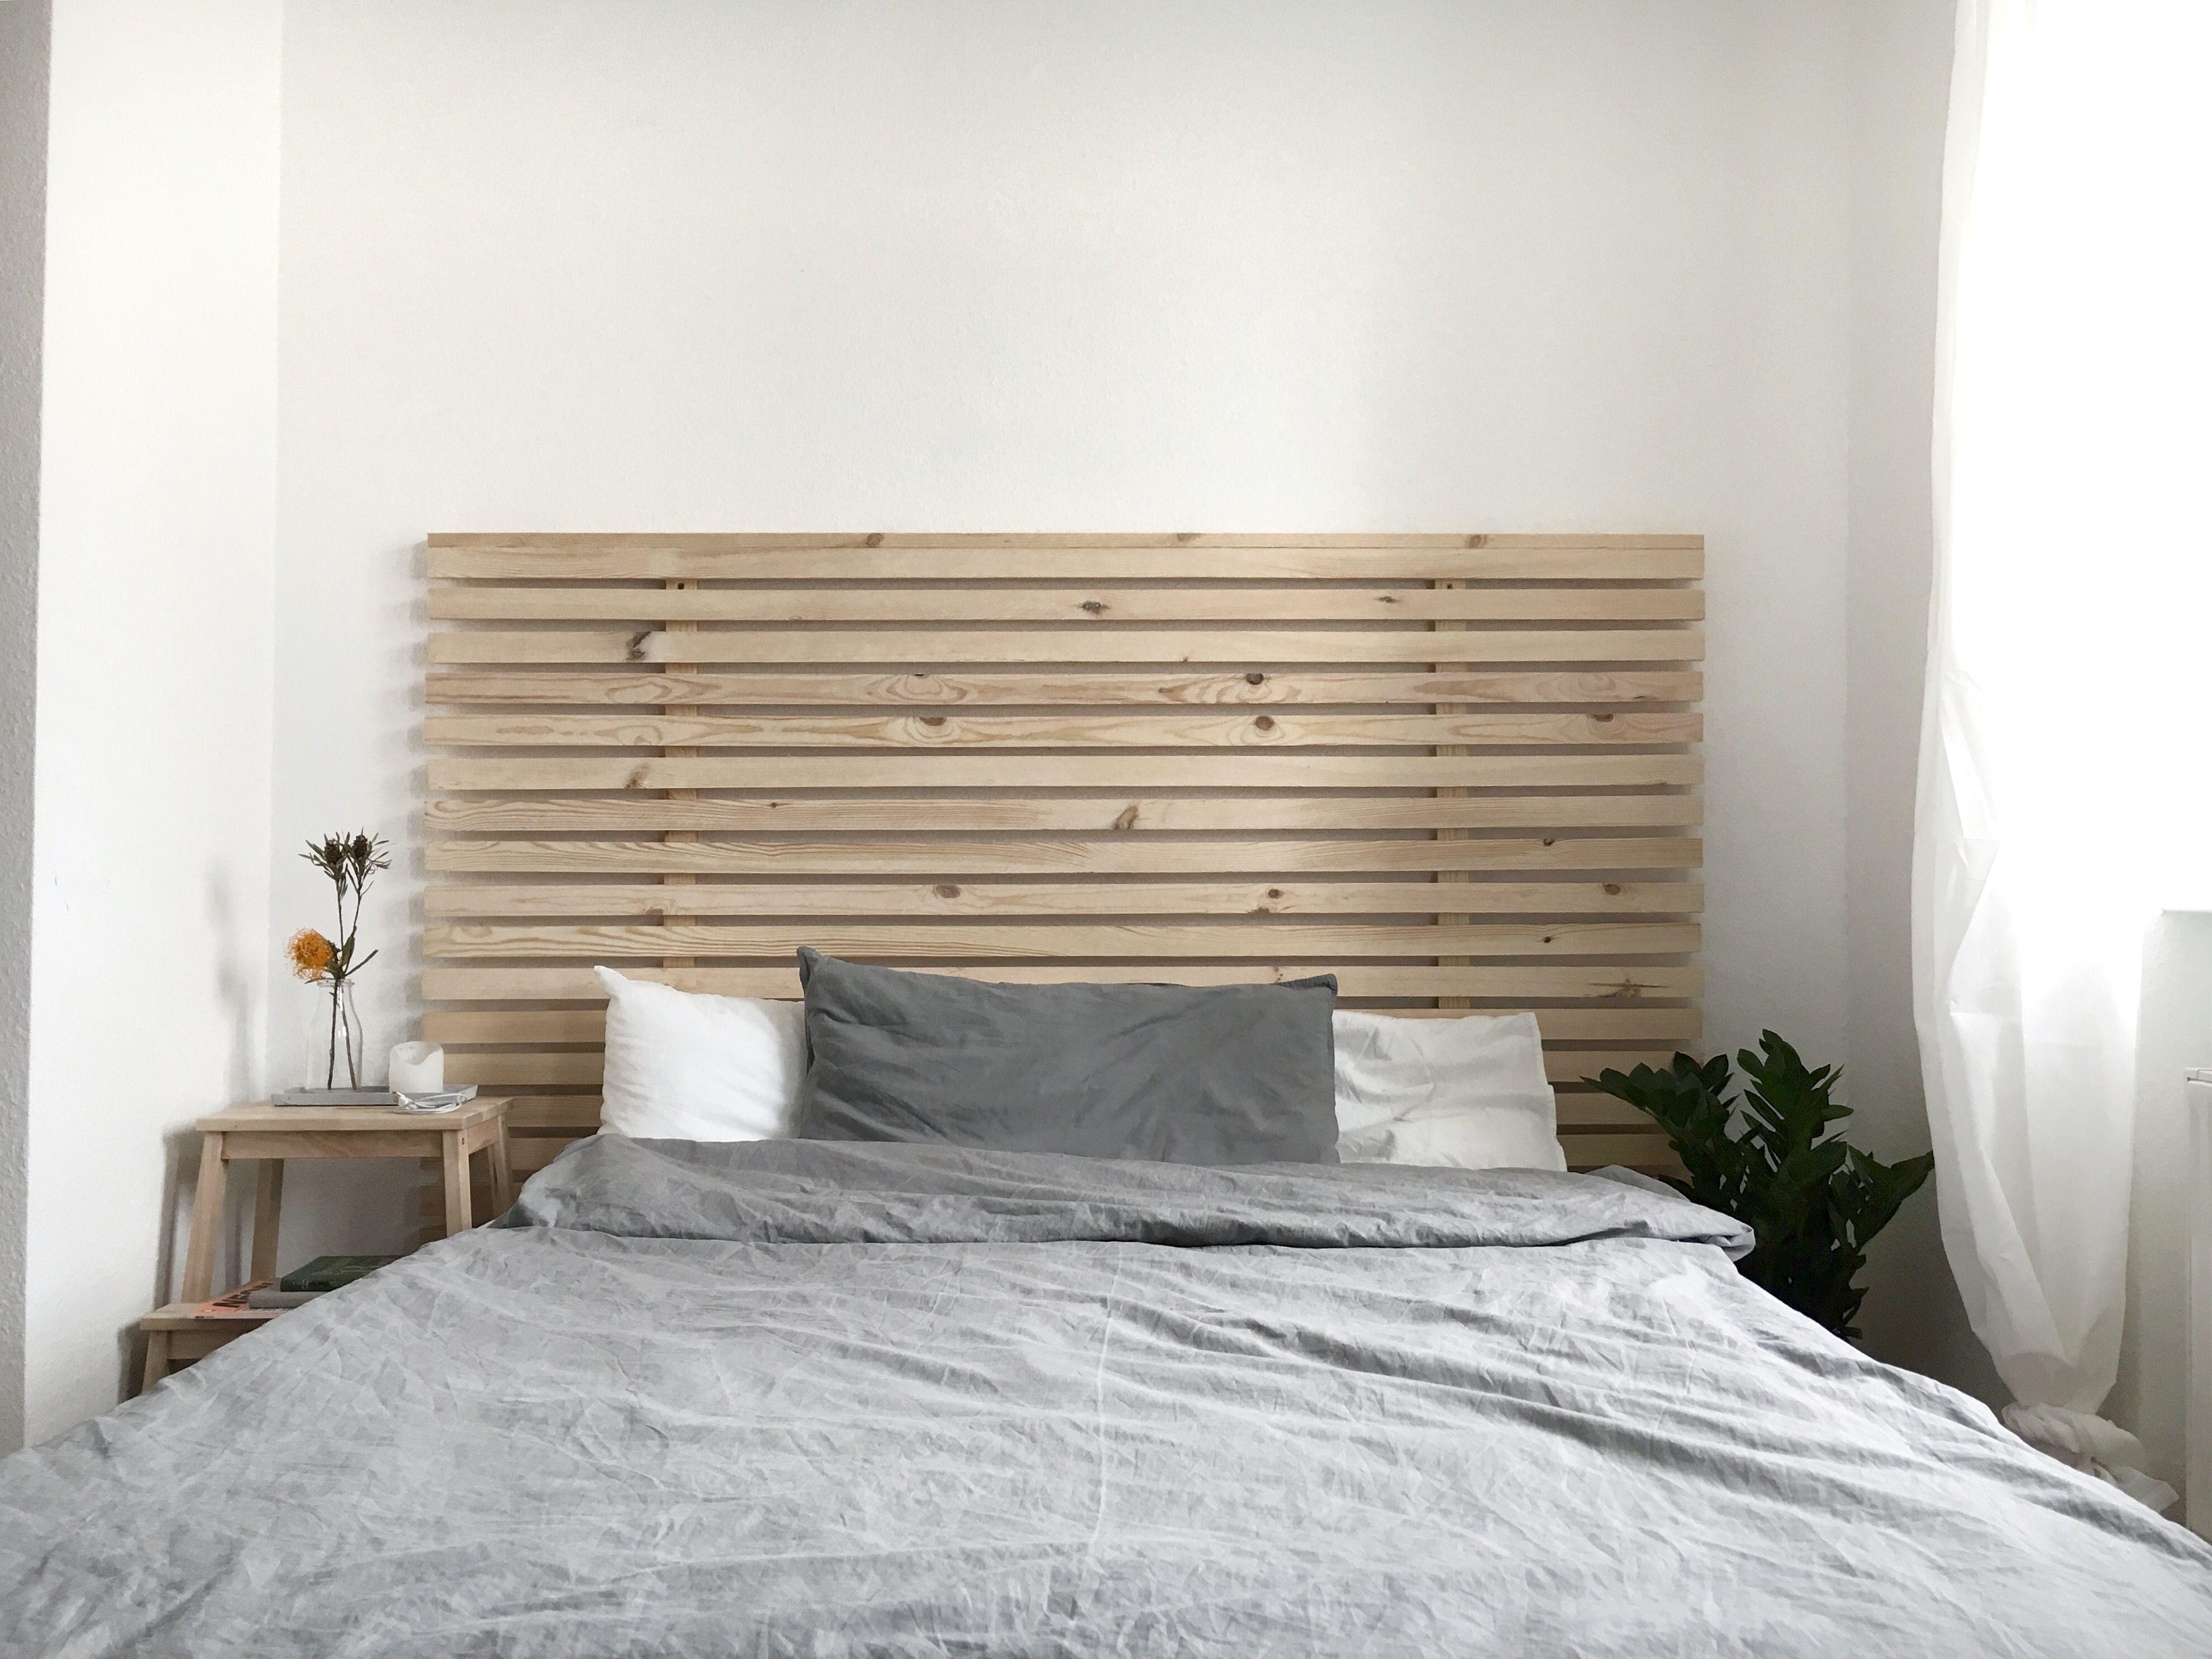 Pin By Genevieve Varnell On House Diy Bed Headboard Bedroom Headboard Headboard Styles